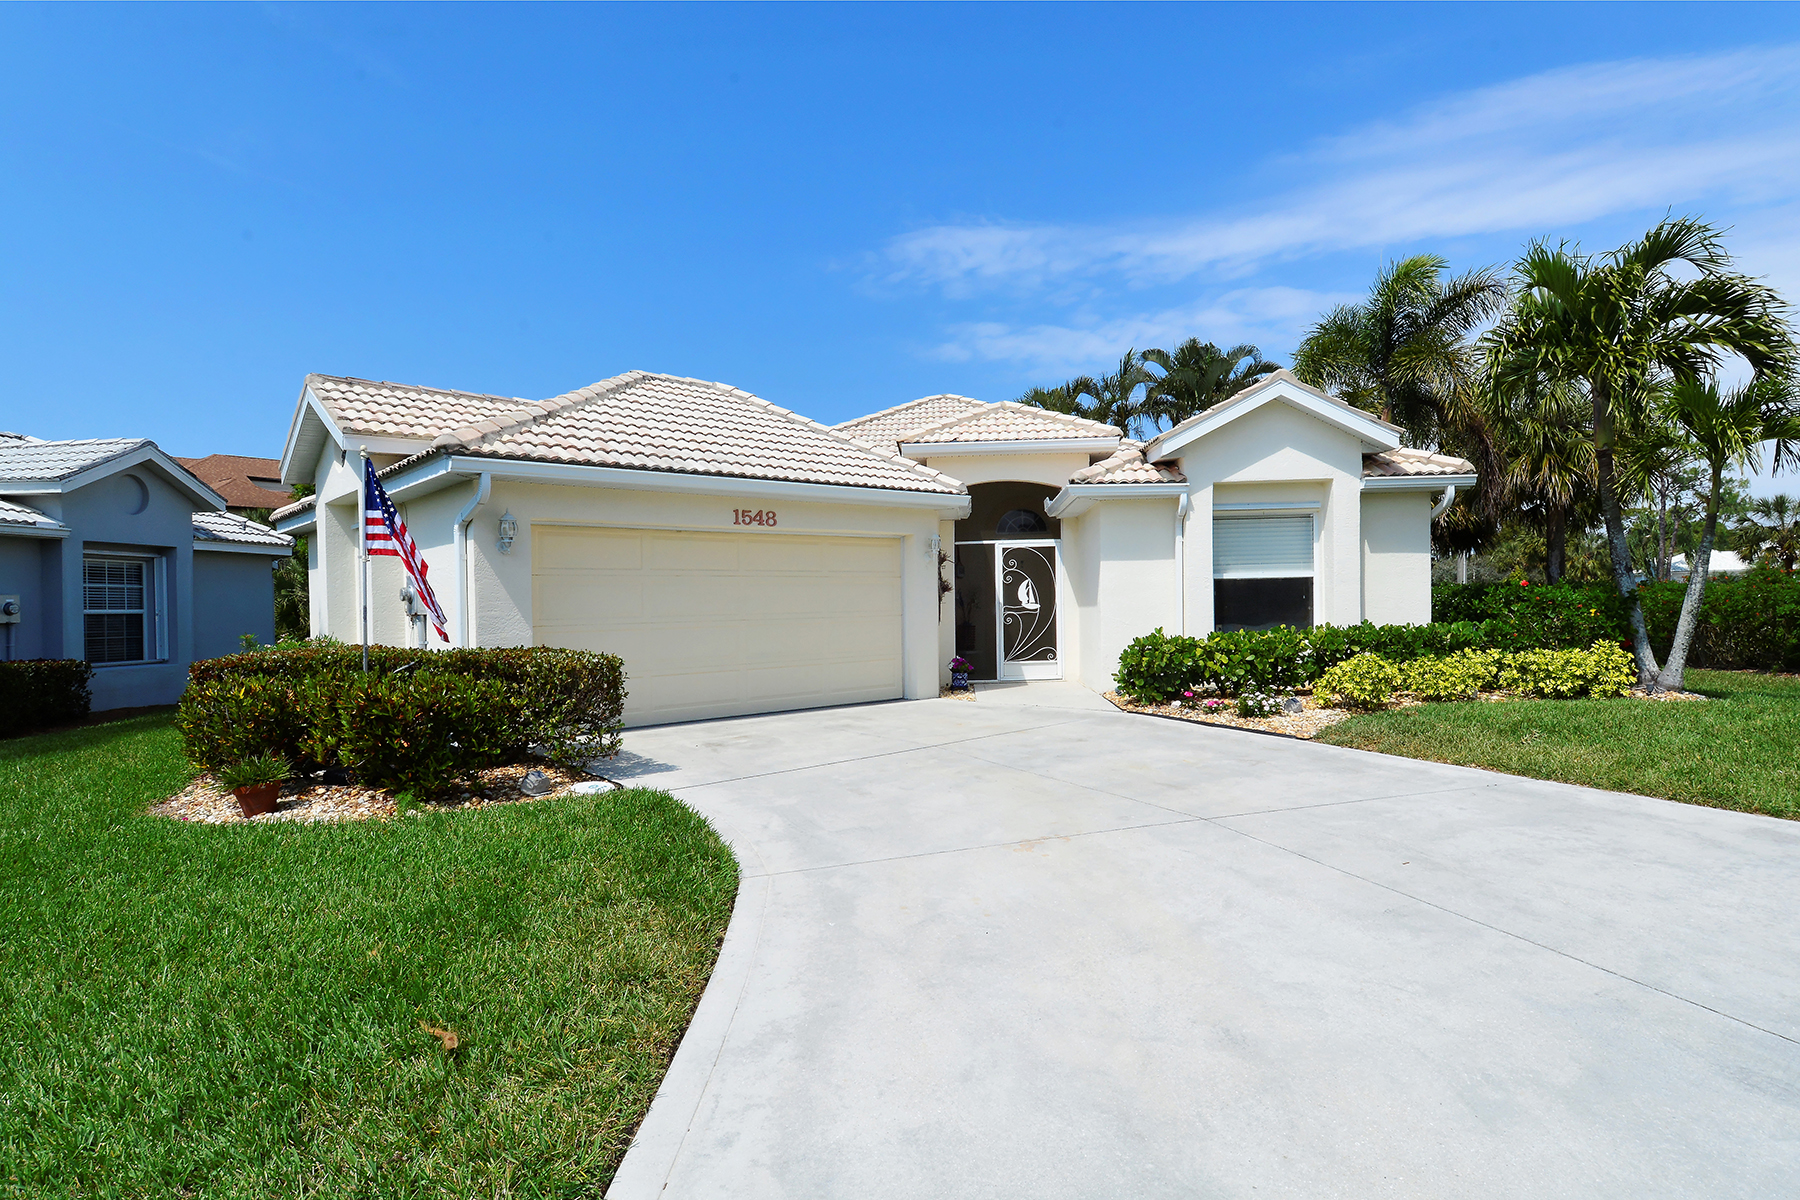 Single Family Home for Sale at EGRET POINTE - PUNTA GORDA 1548 Islamorada Blvd Punta Gorda, Florida 33955 United States